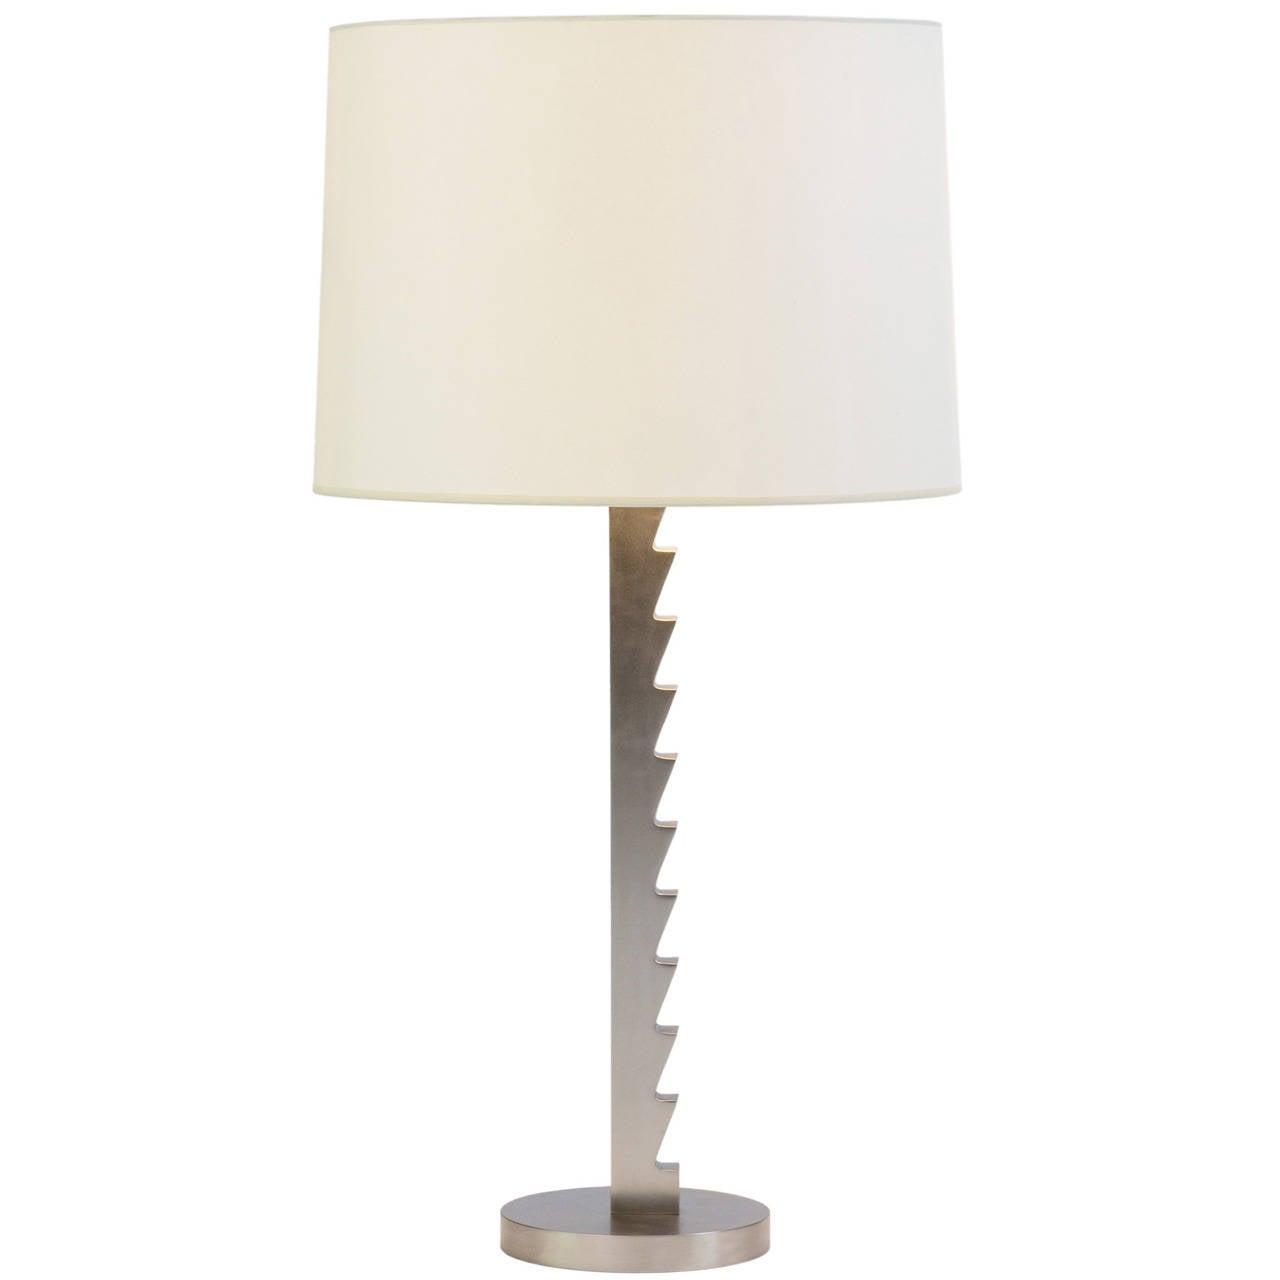 Futurist Table Lamp